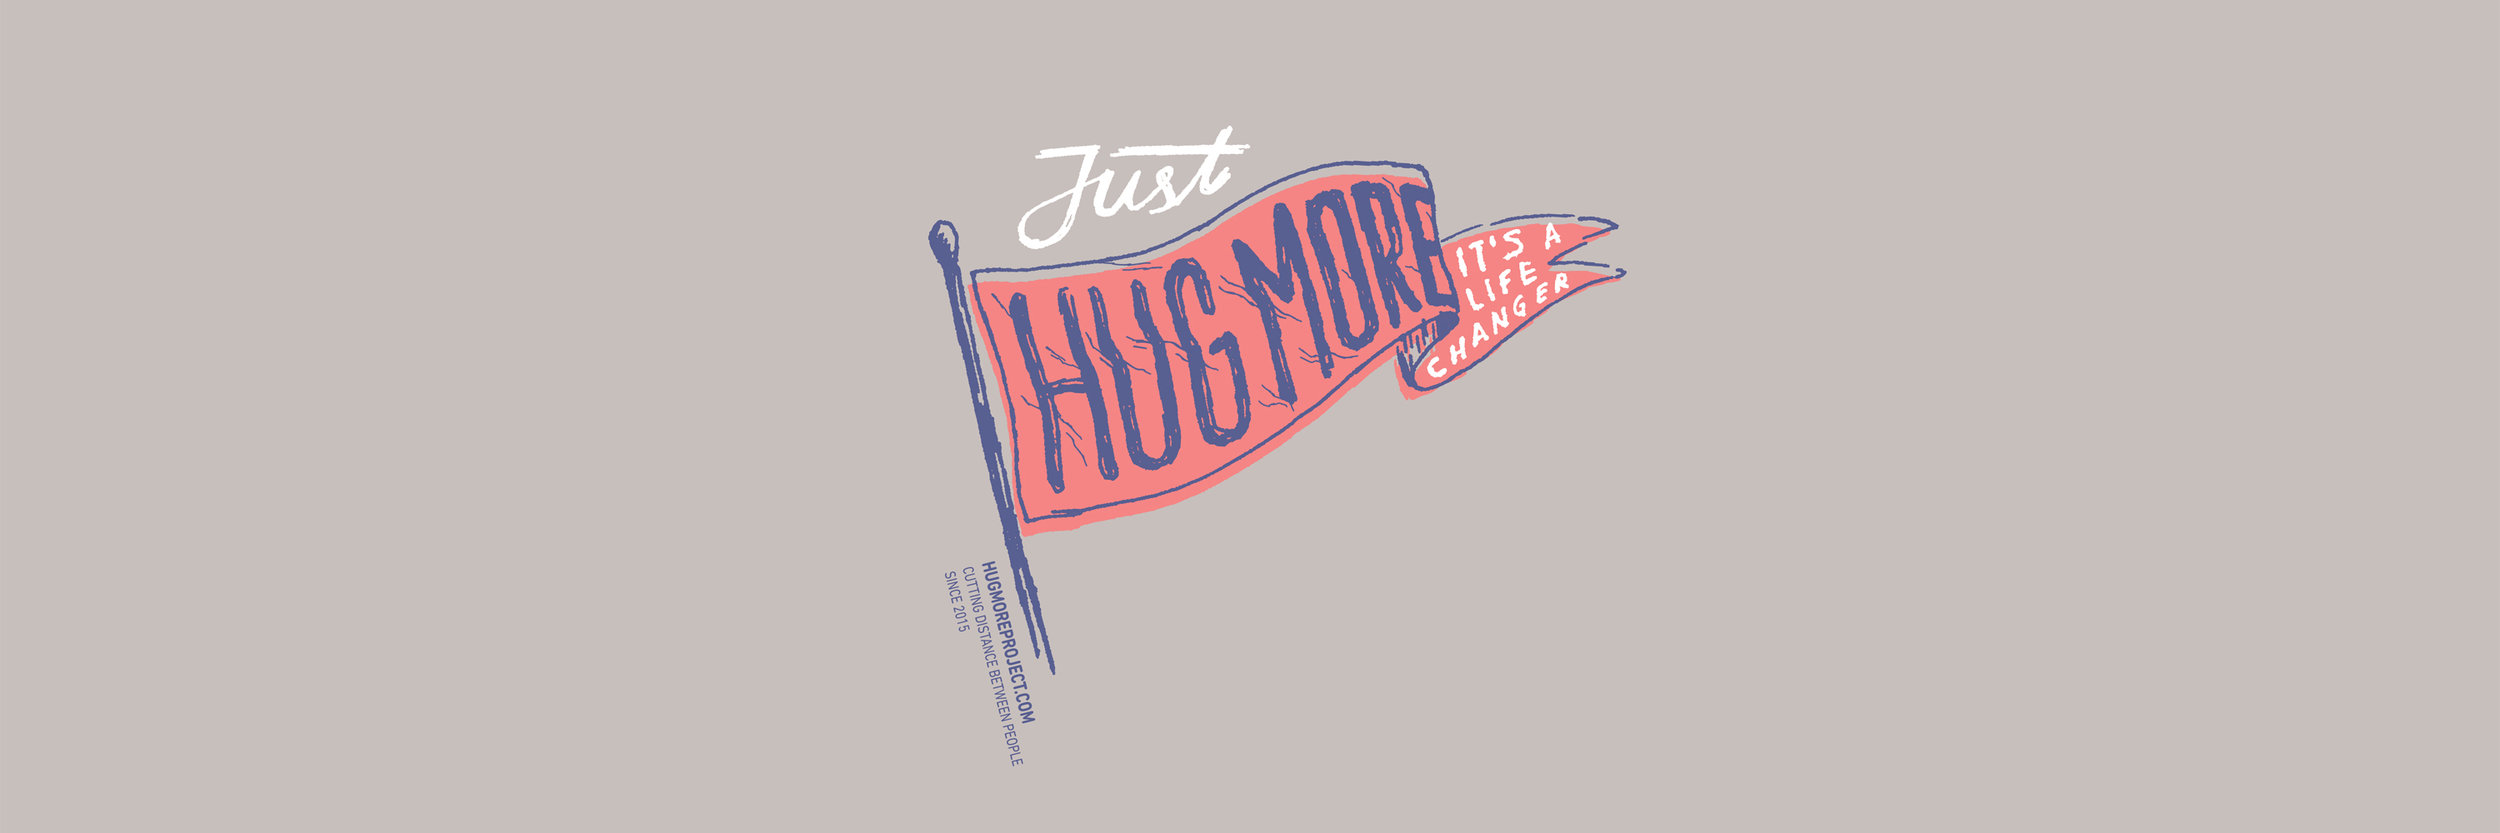 just_hug_more-BRIEF-main_banner.jpg